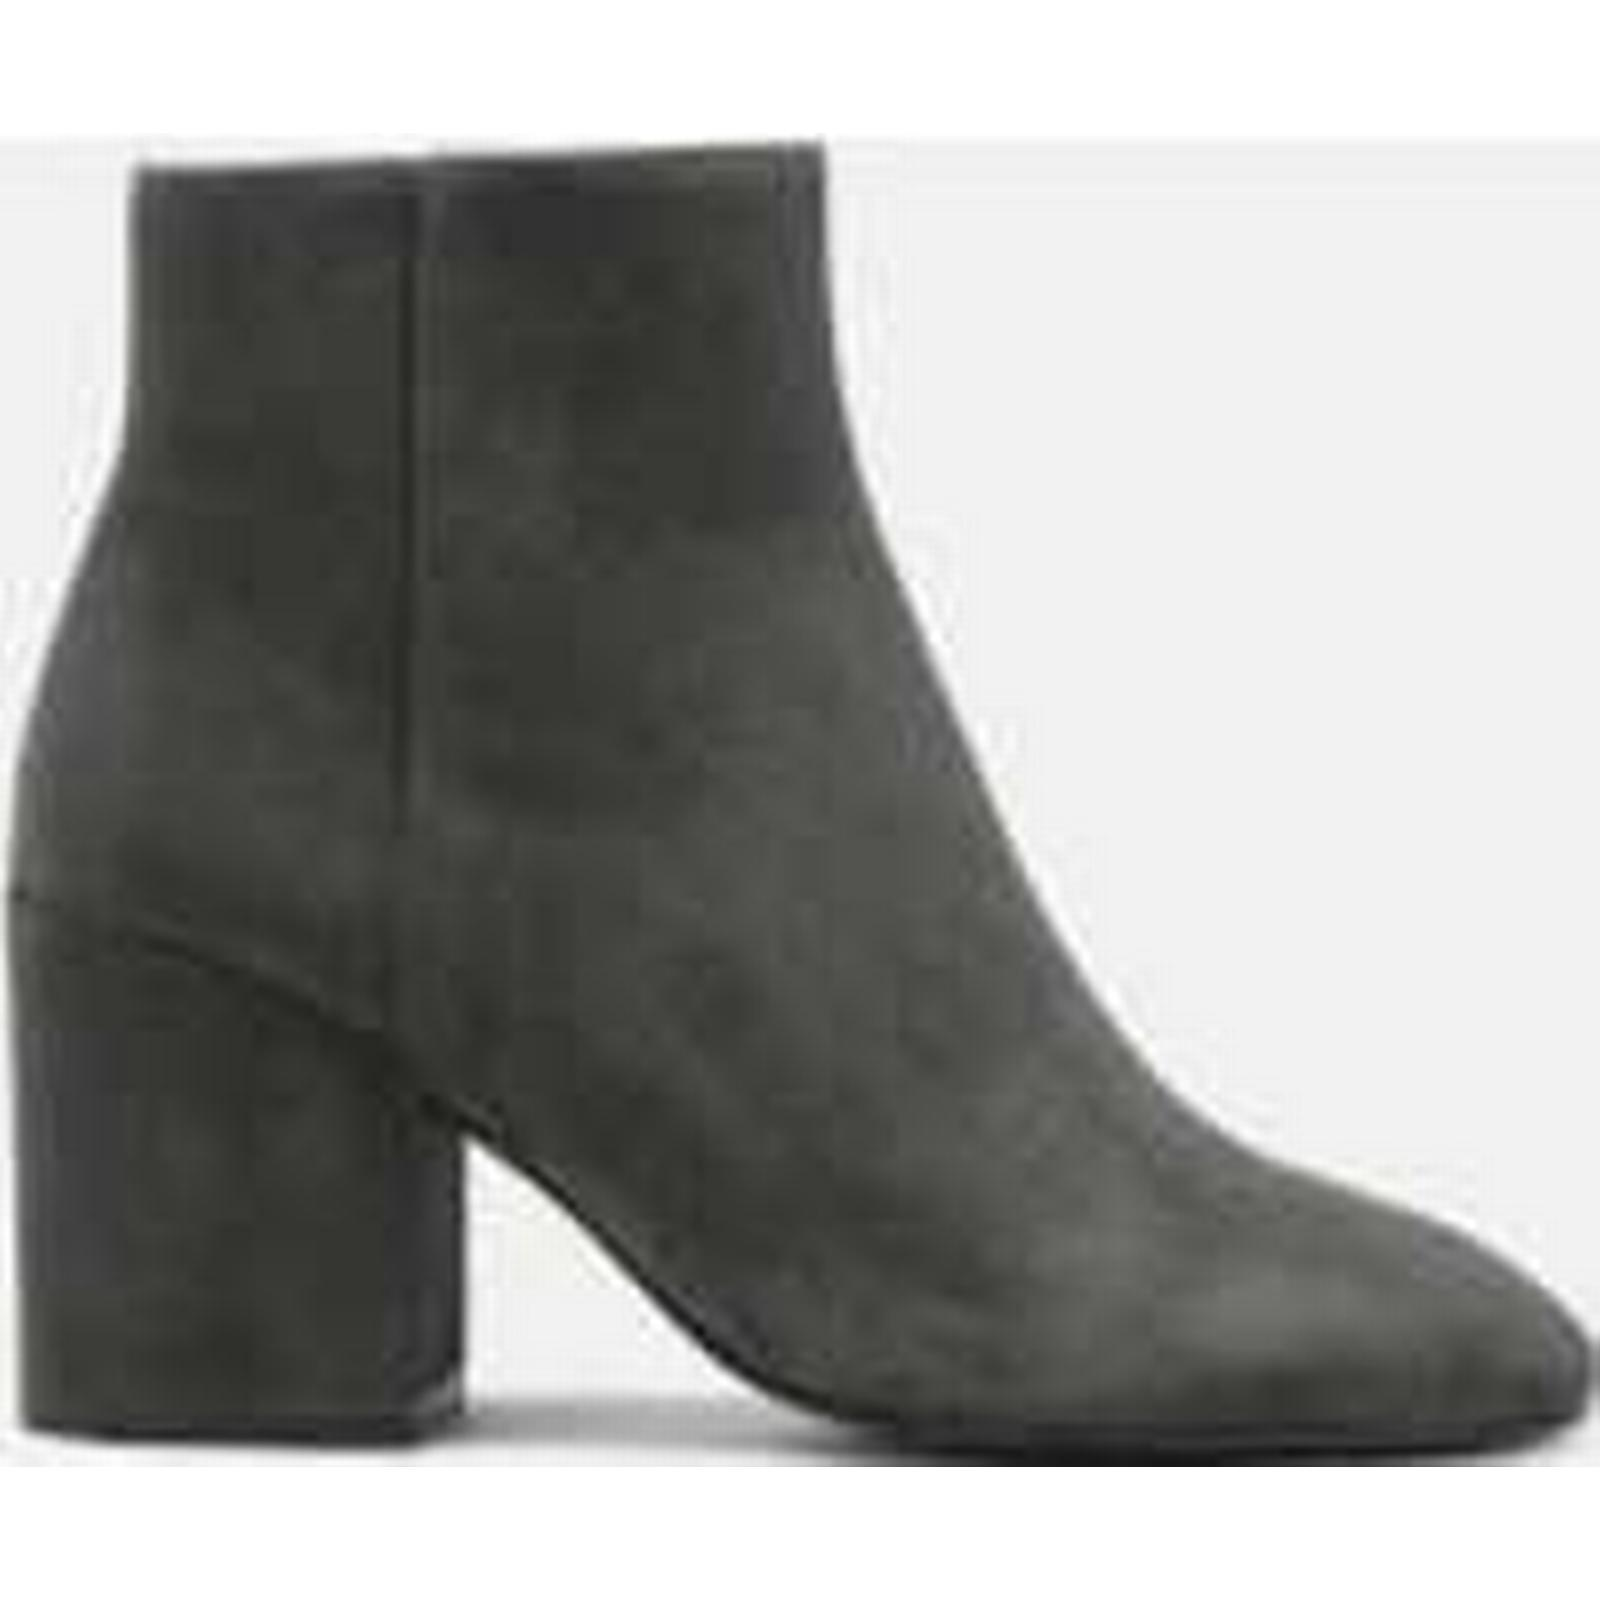 Ash Women's Boots Eden Suede Heeled Ankle Boots Women's - Bistro - UK 4 - Grey 869d4e